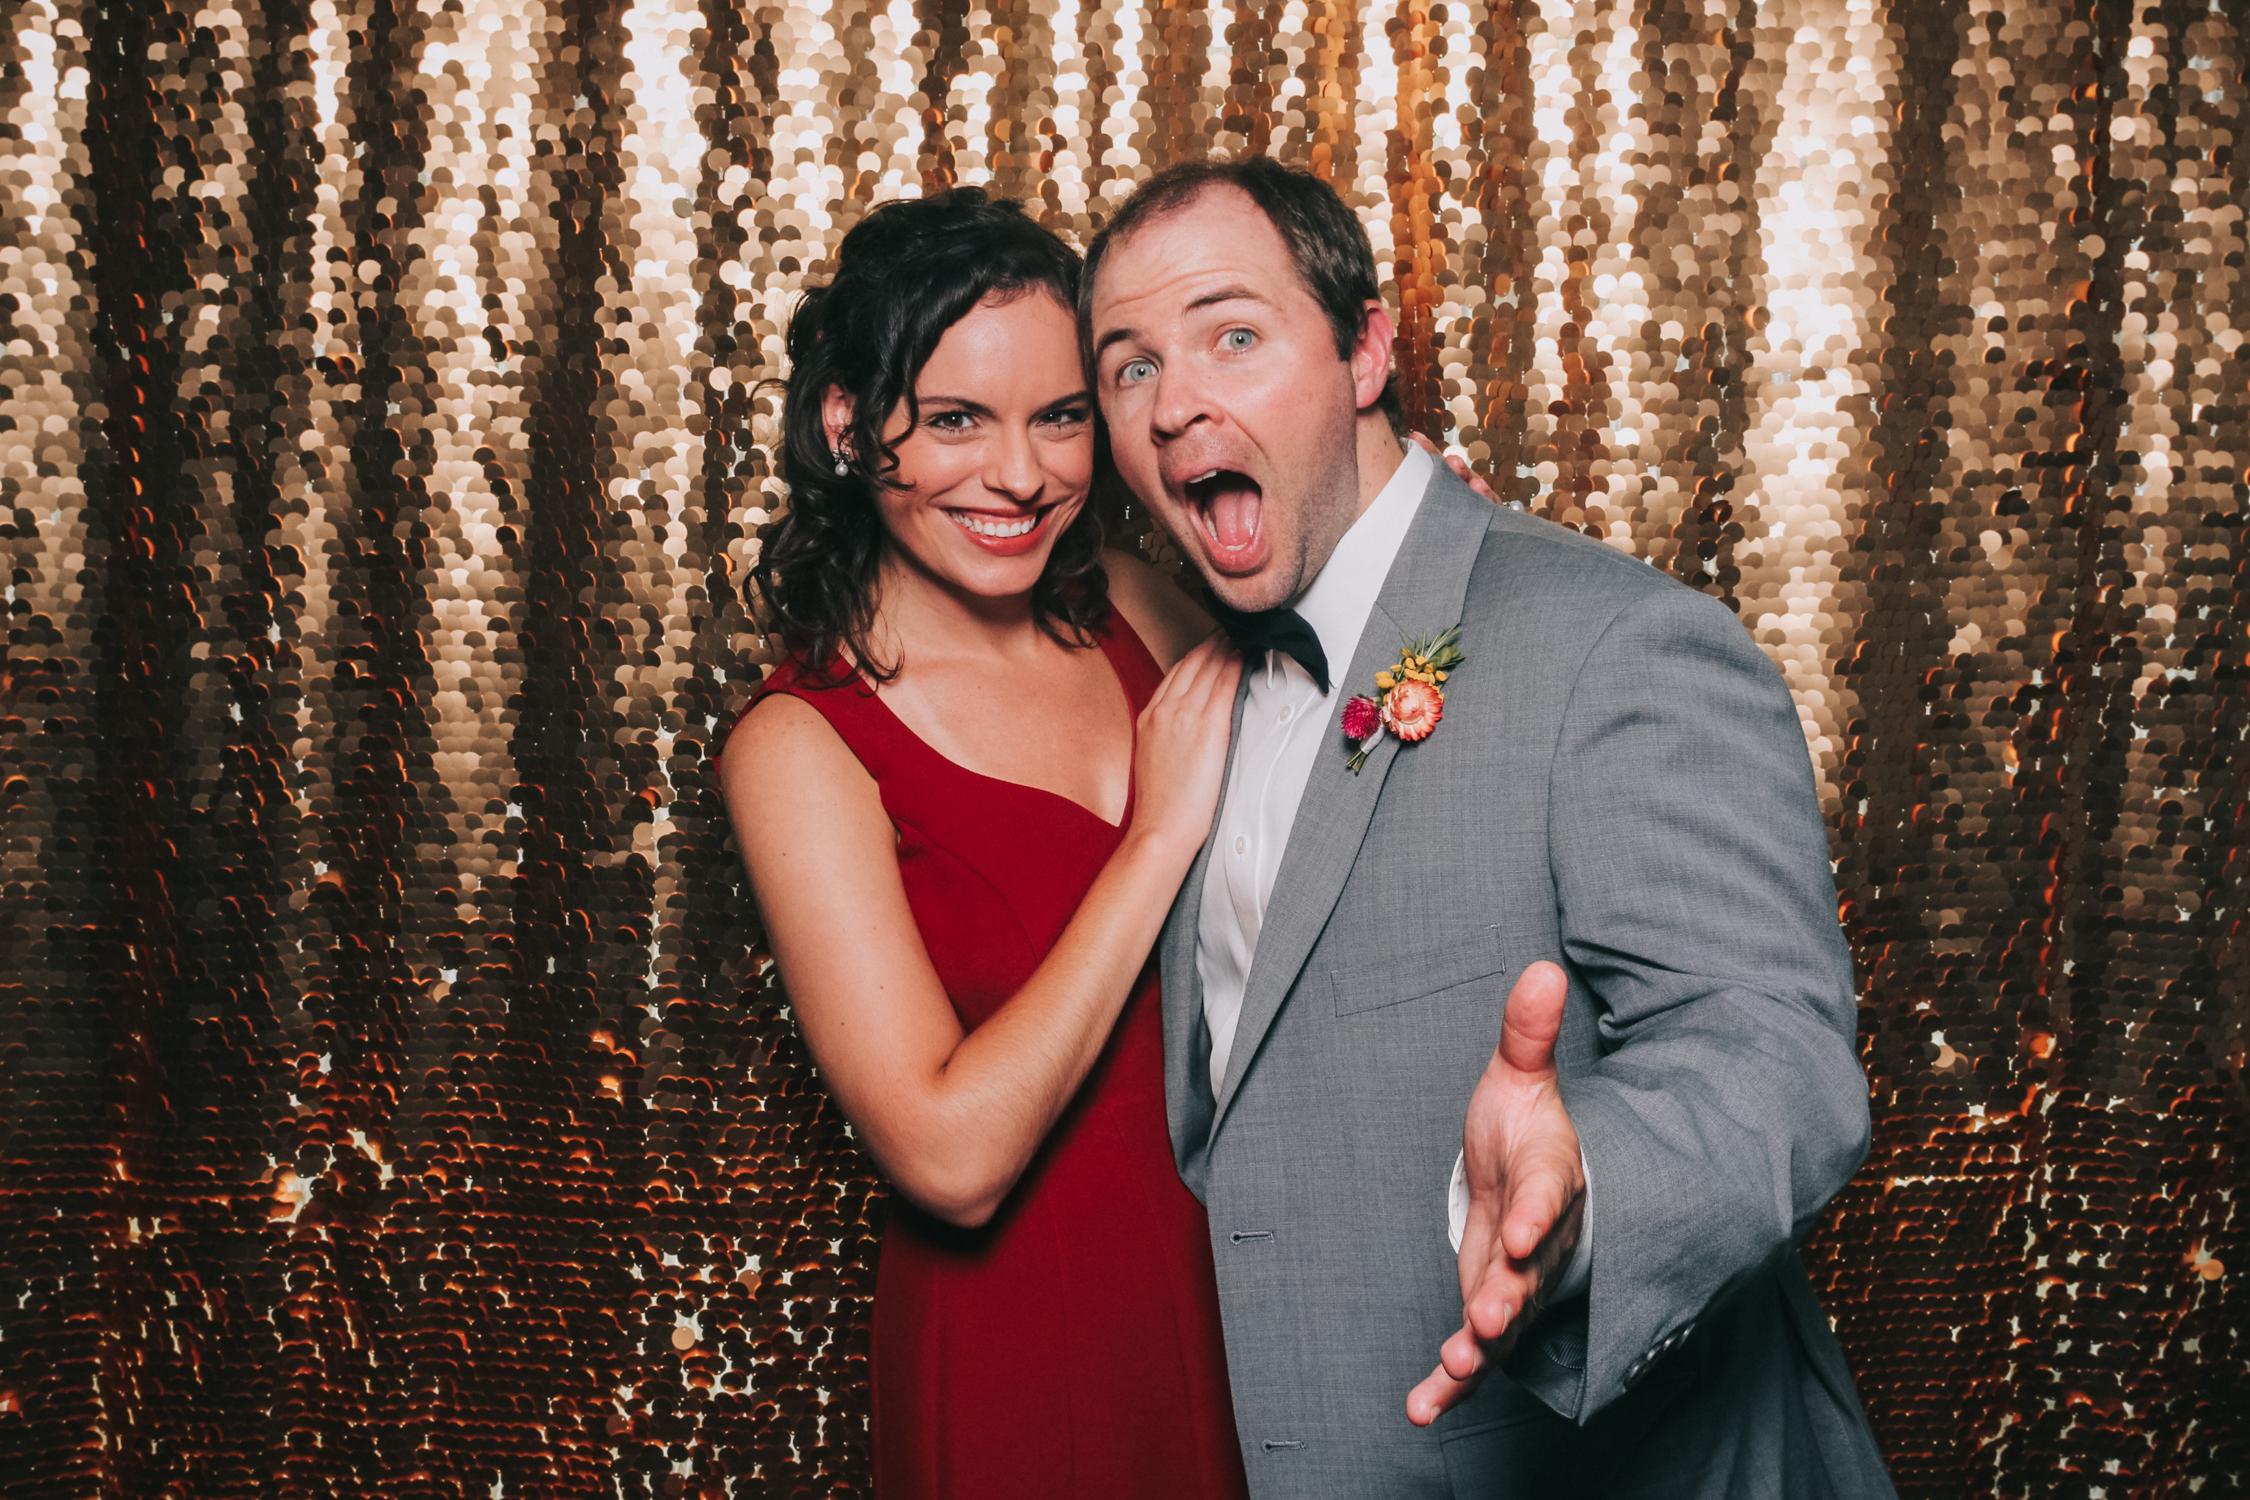 baltimore rusty scupper wedding photo booth-13.jpg